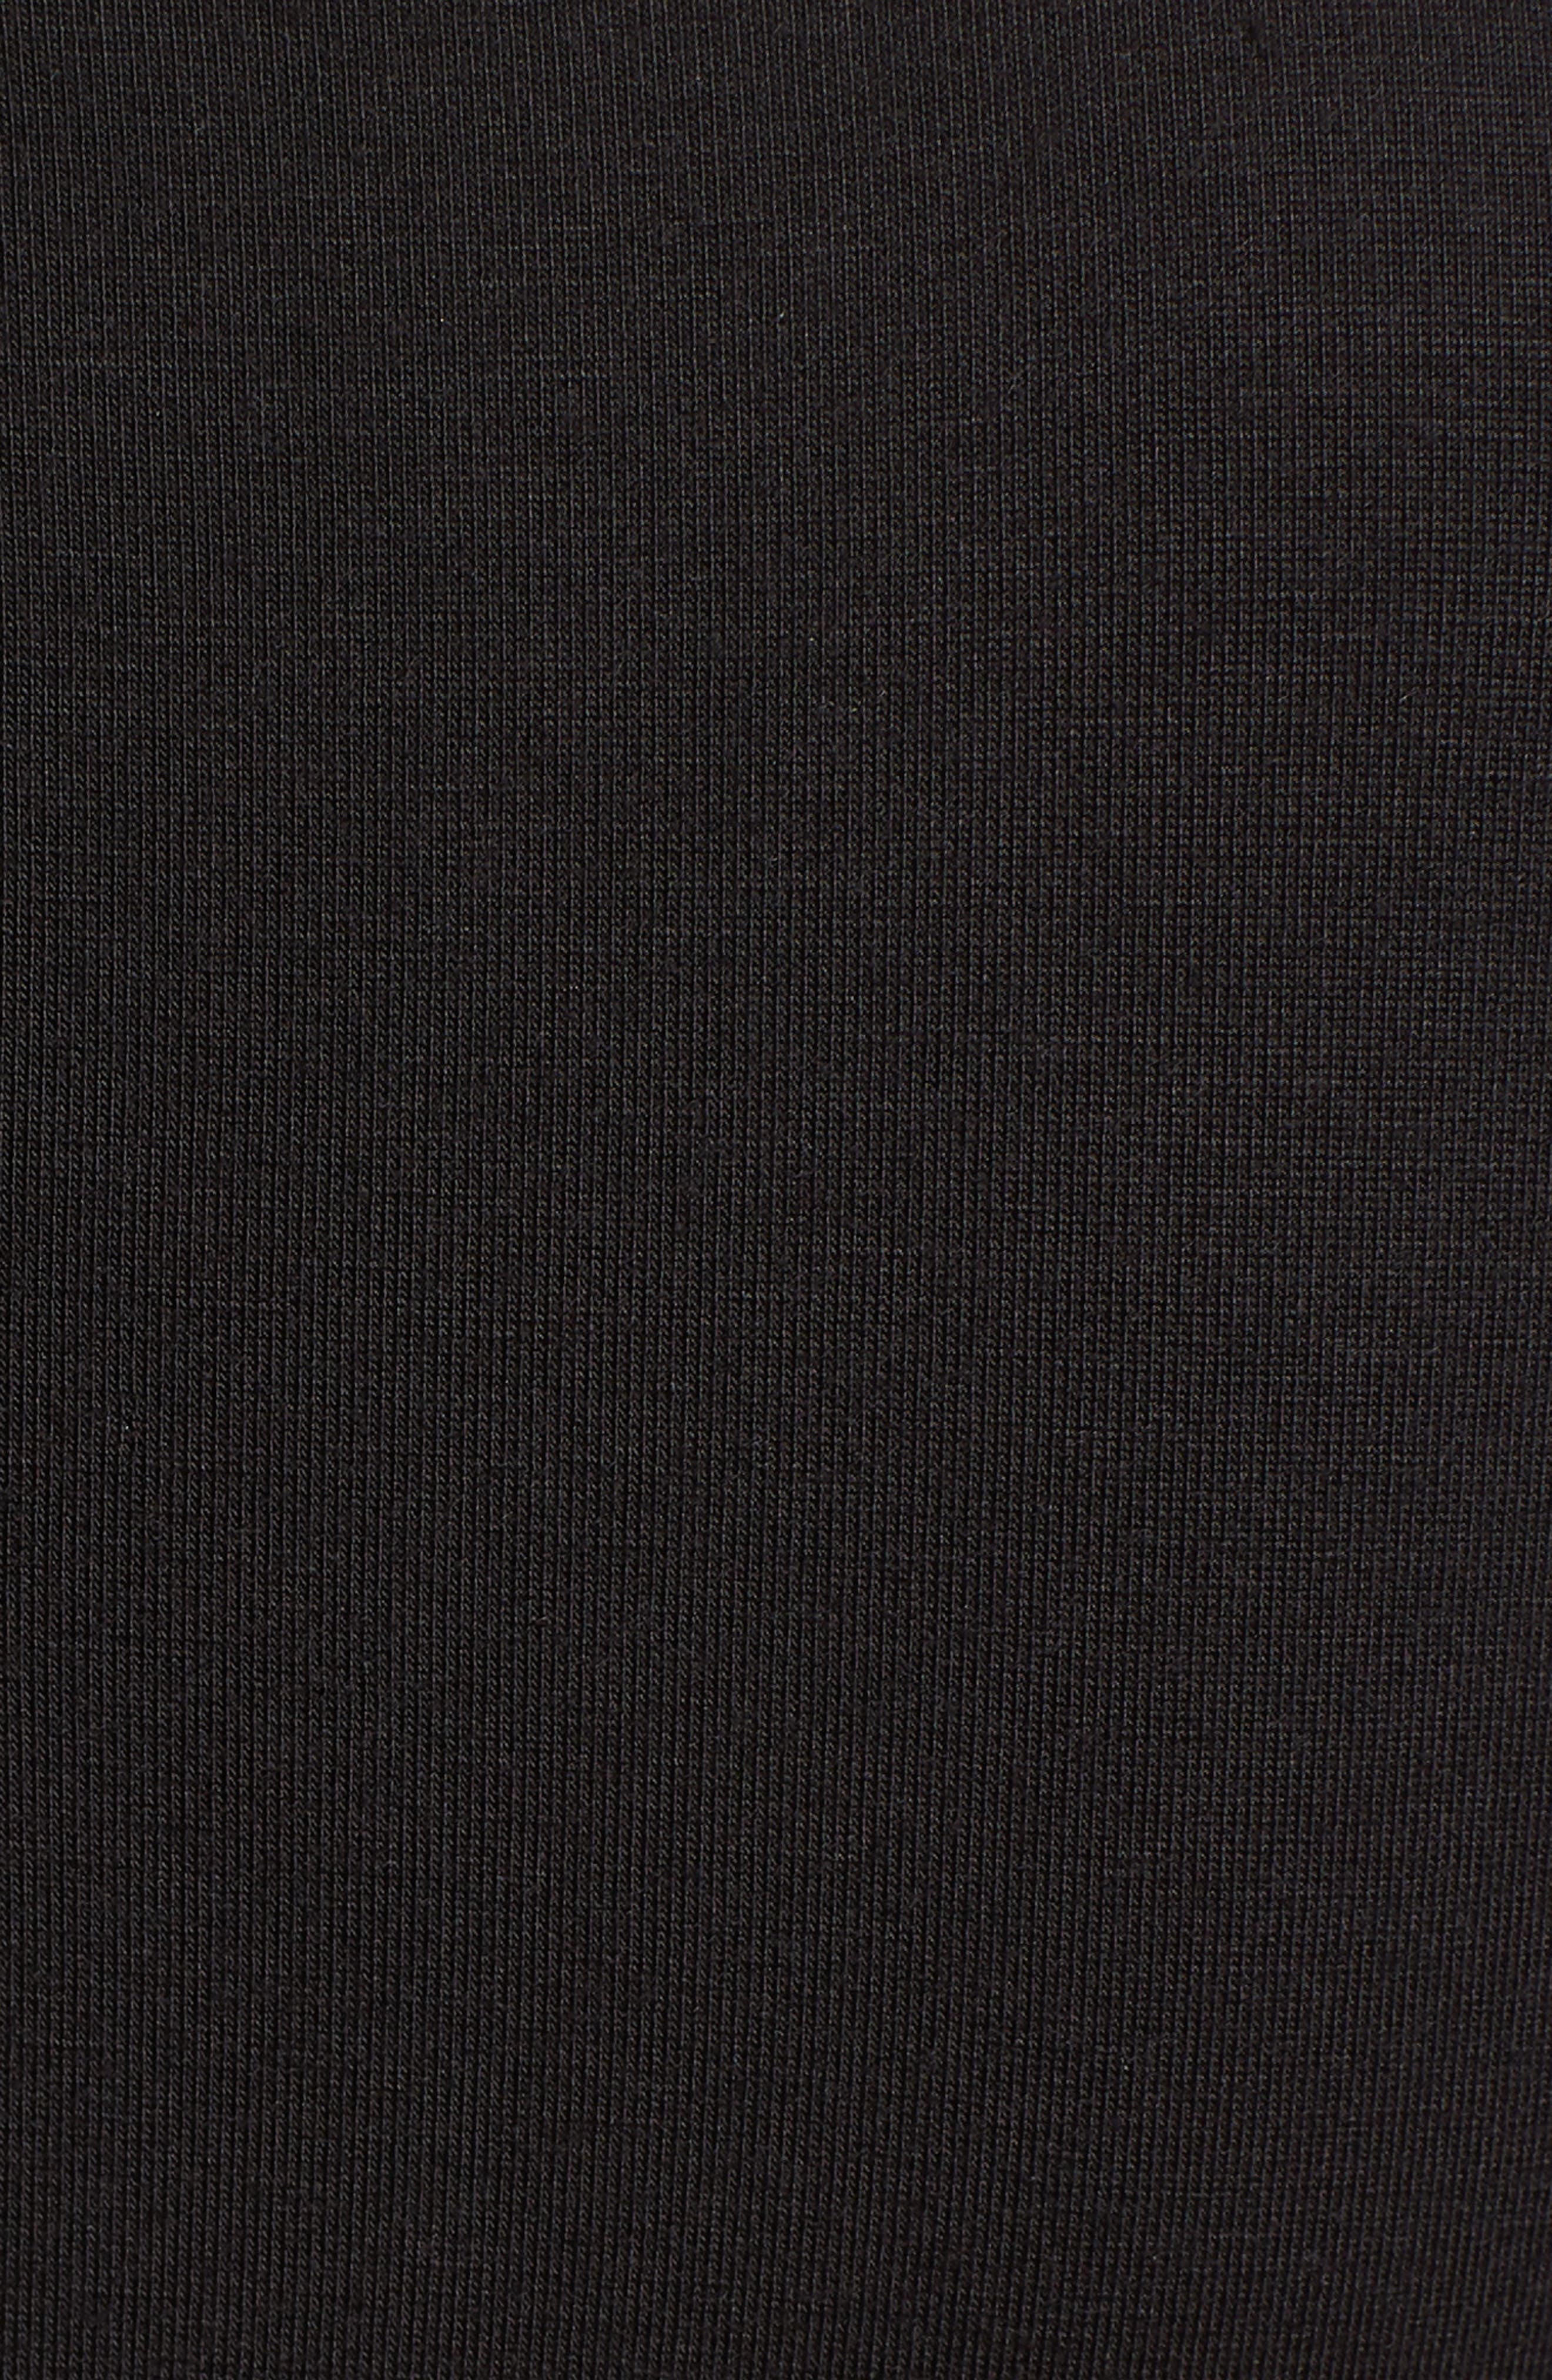 Tokyo Choker Top,                             Alternate thumbnail 5, color,                             001